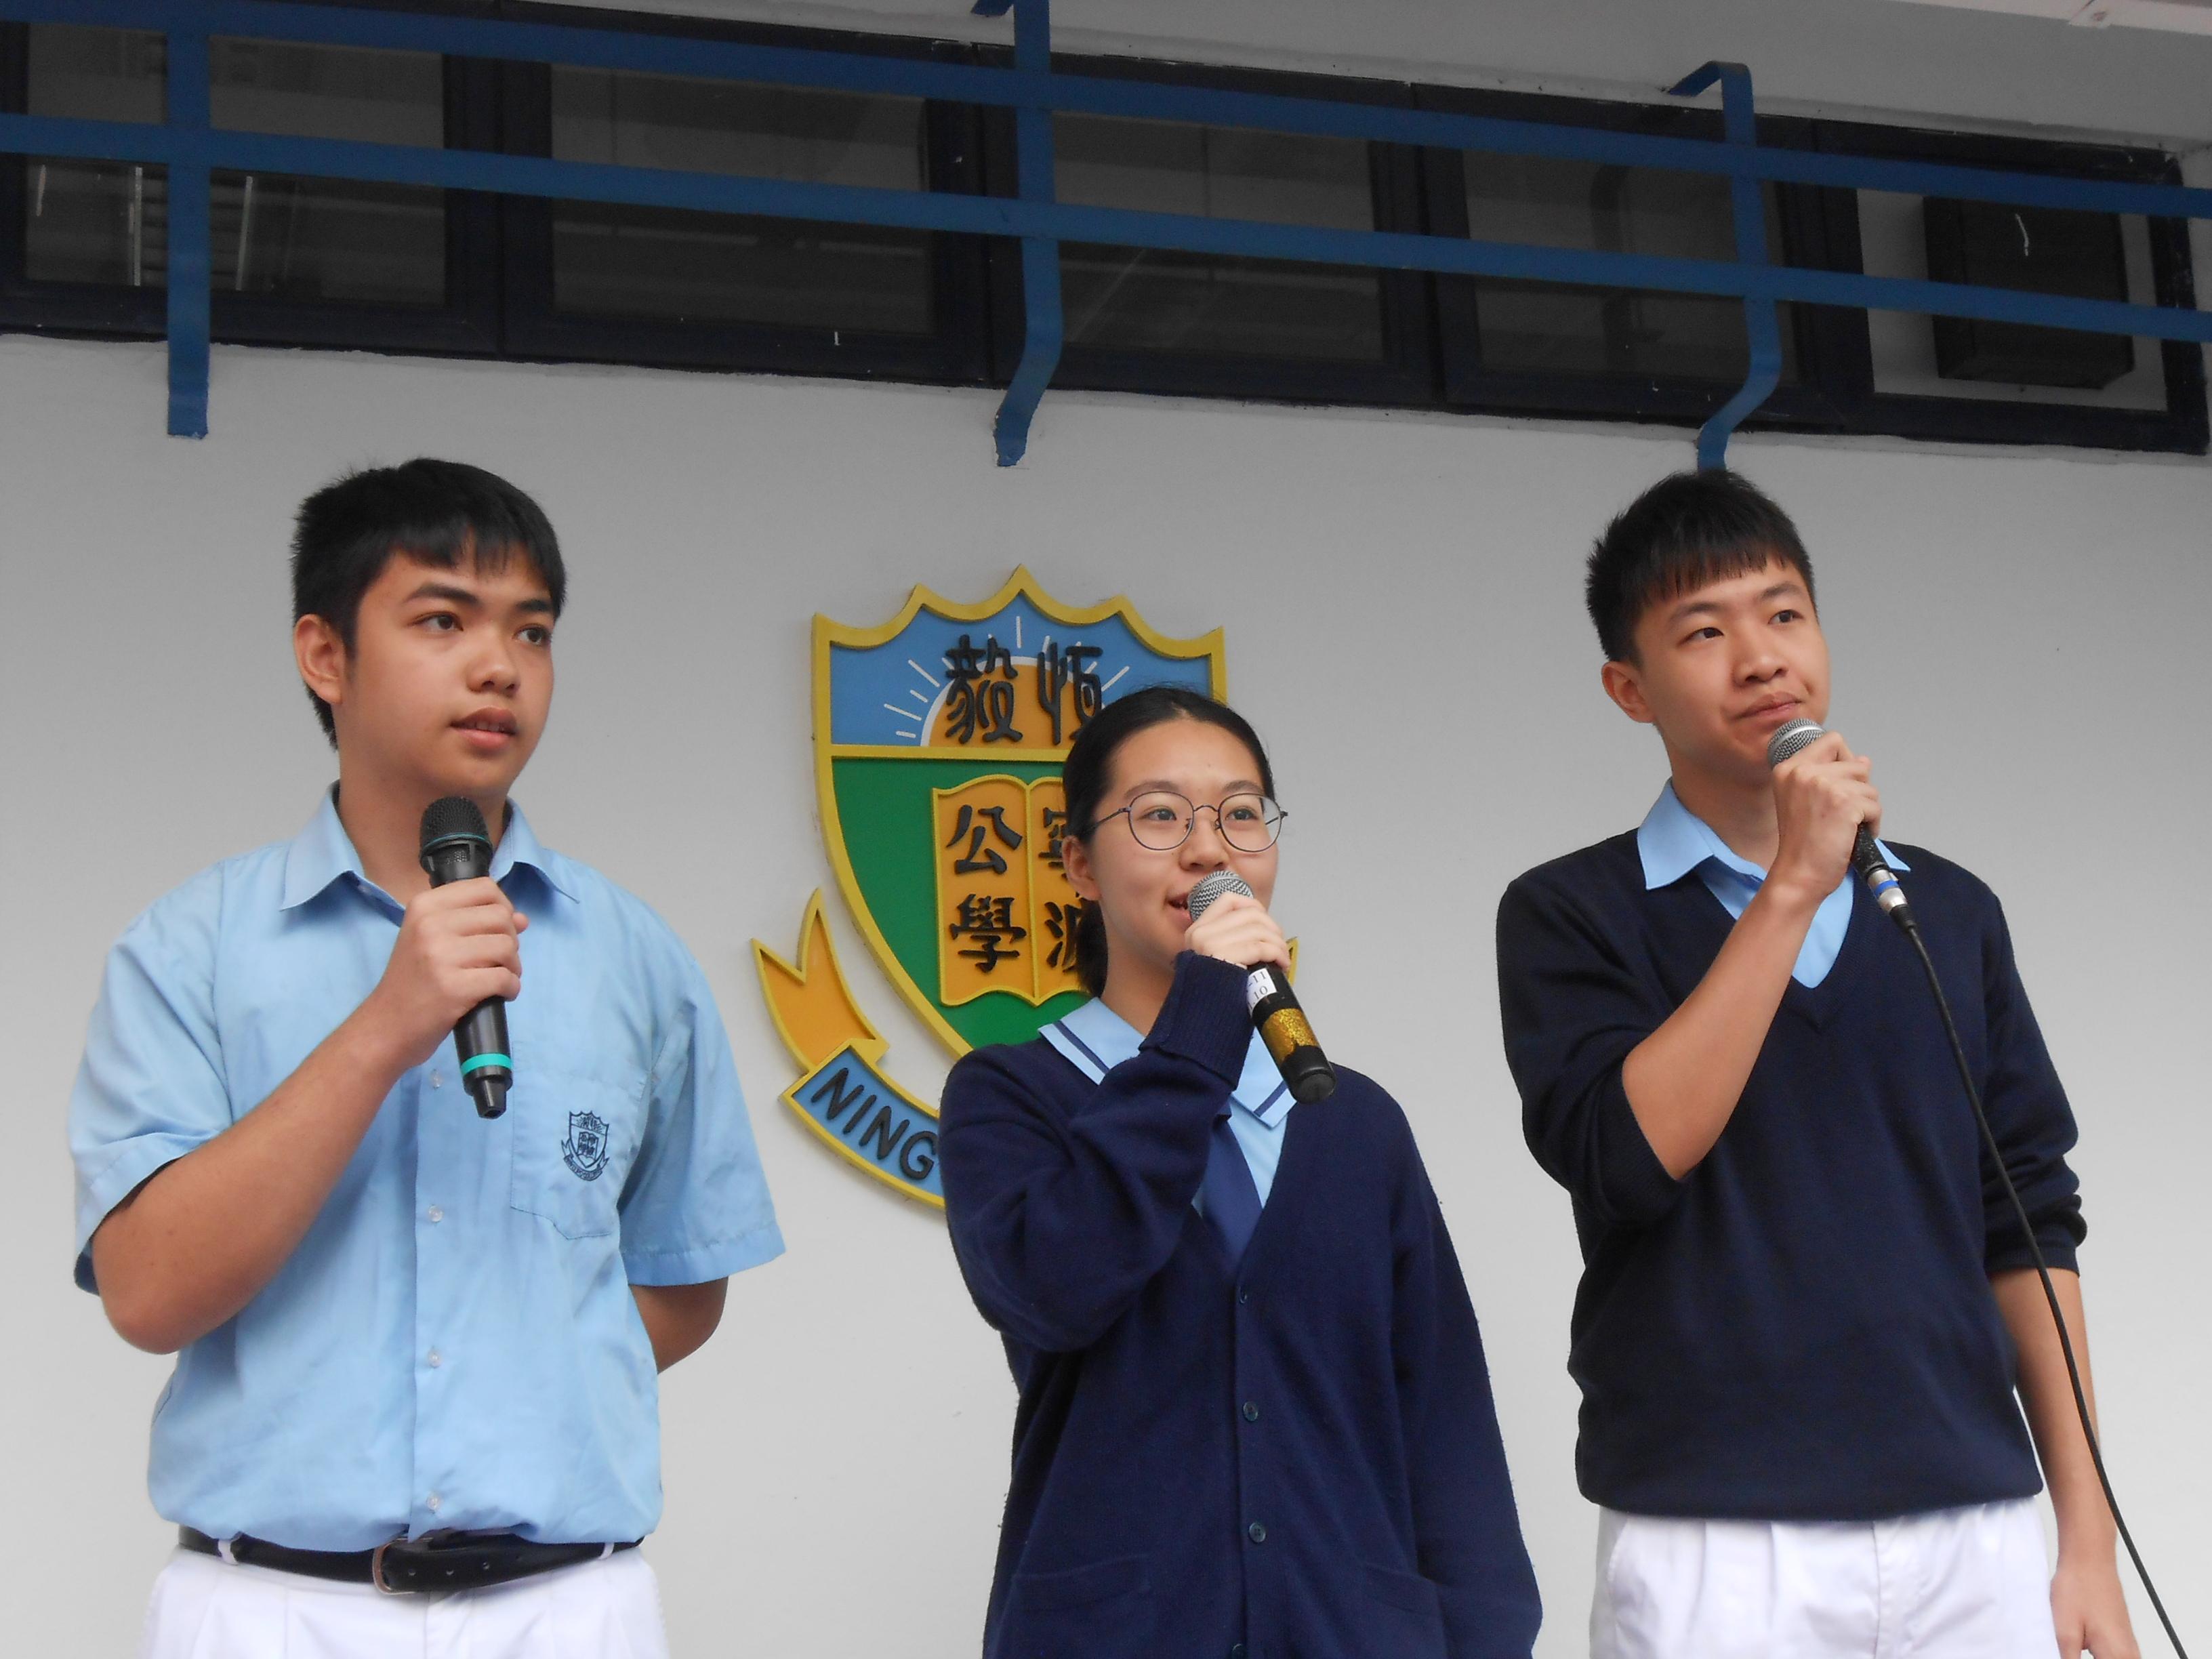 http://npc.edu.hk/sites/default/files/dscn9702.jpg